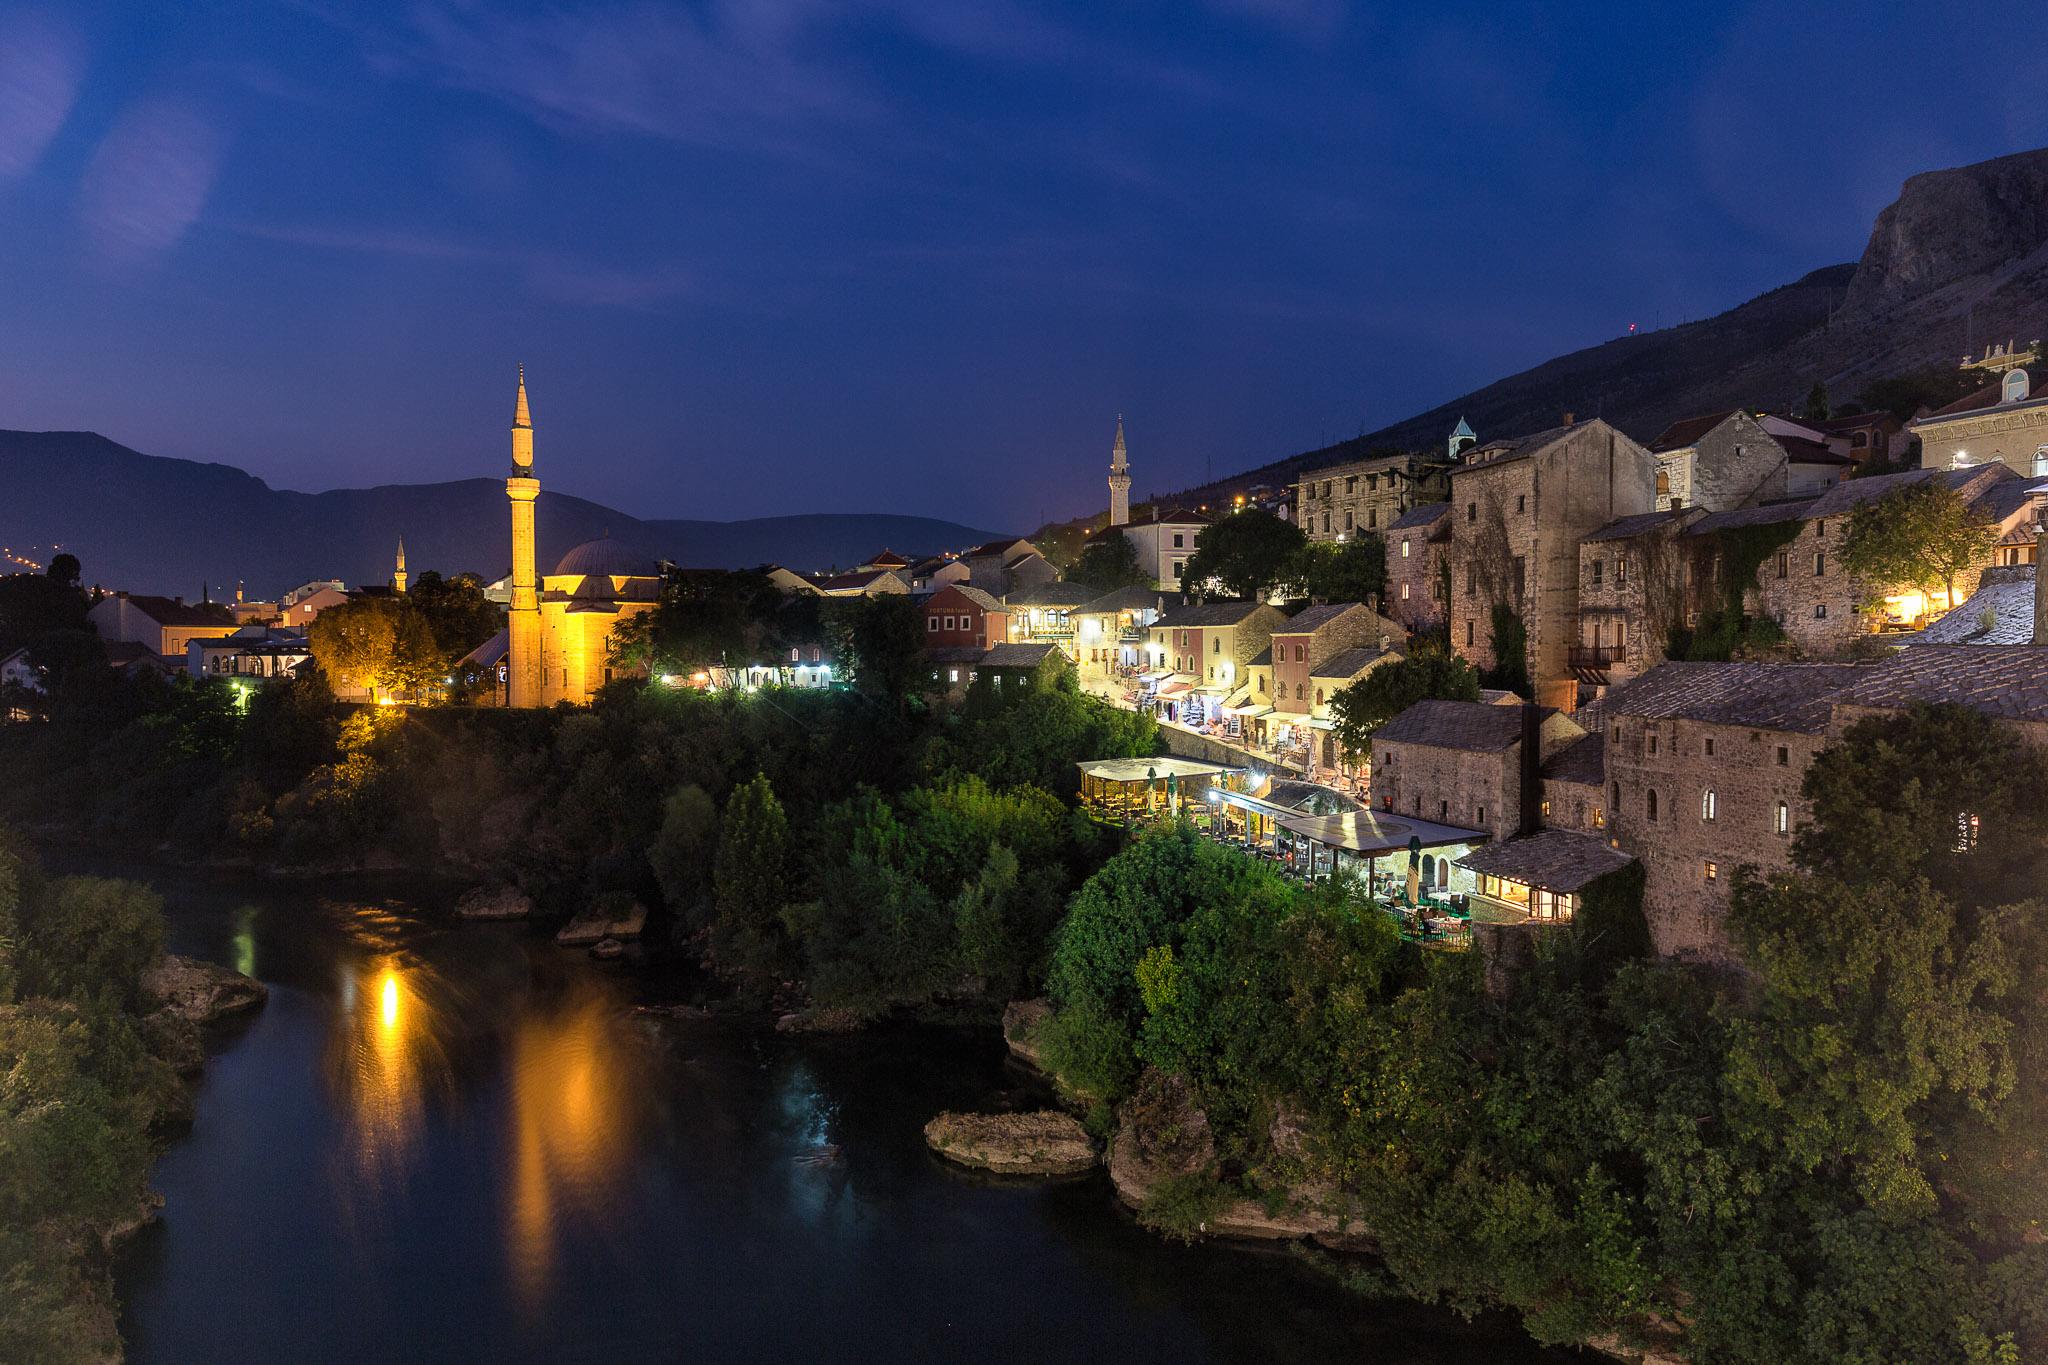 Mostar old town, Bosnia and Herzegovina